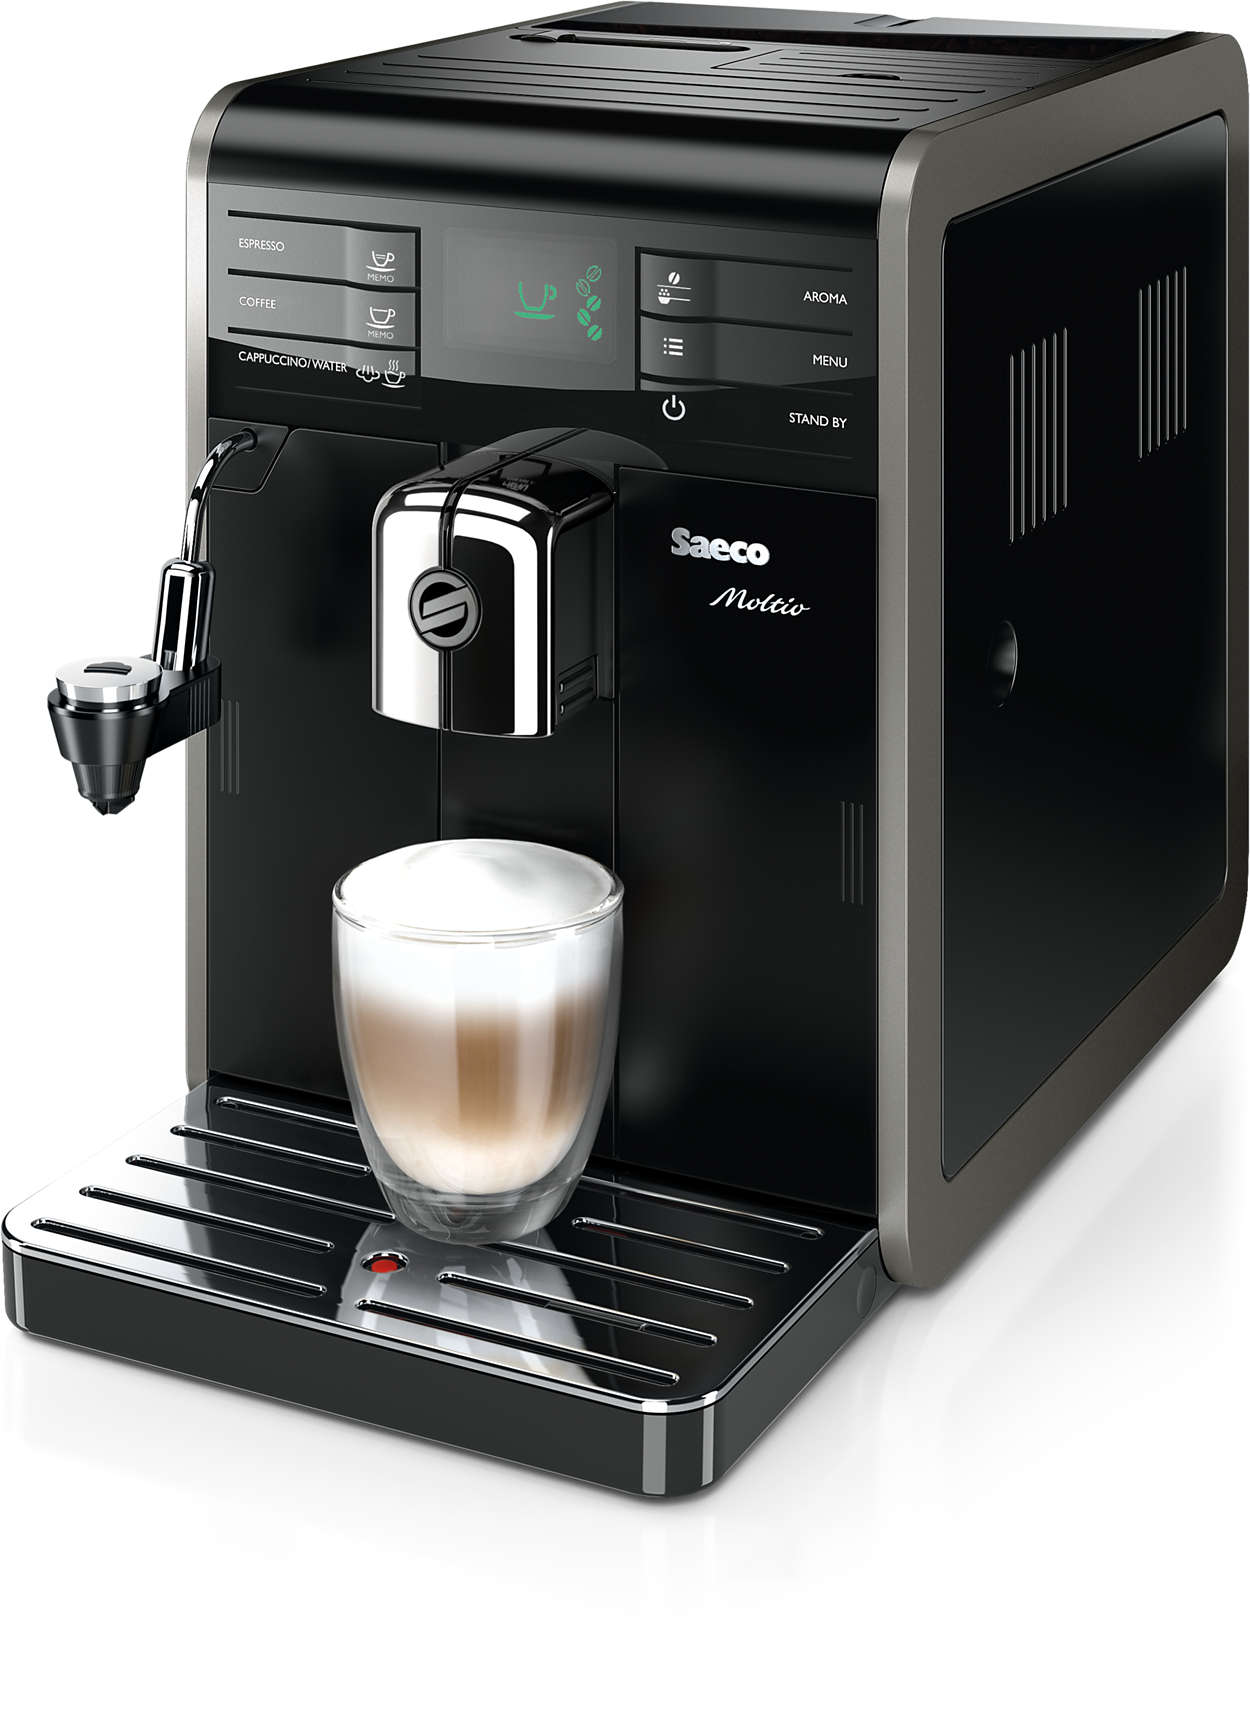 Perfektes Kaffeearoma bei jeder Gelegenheit.